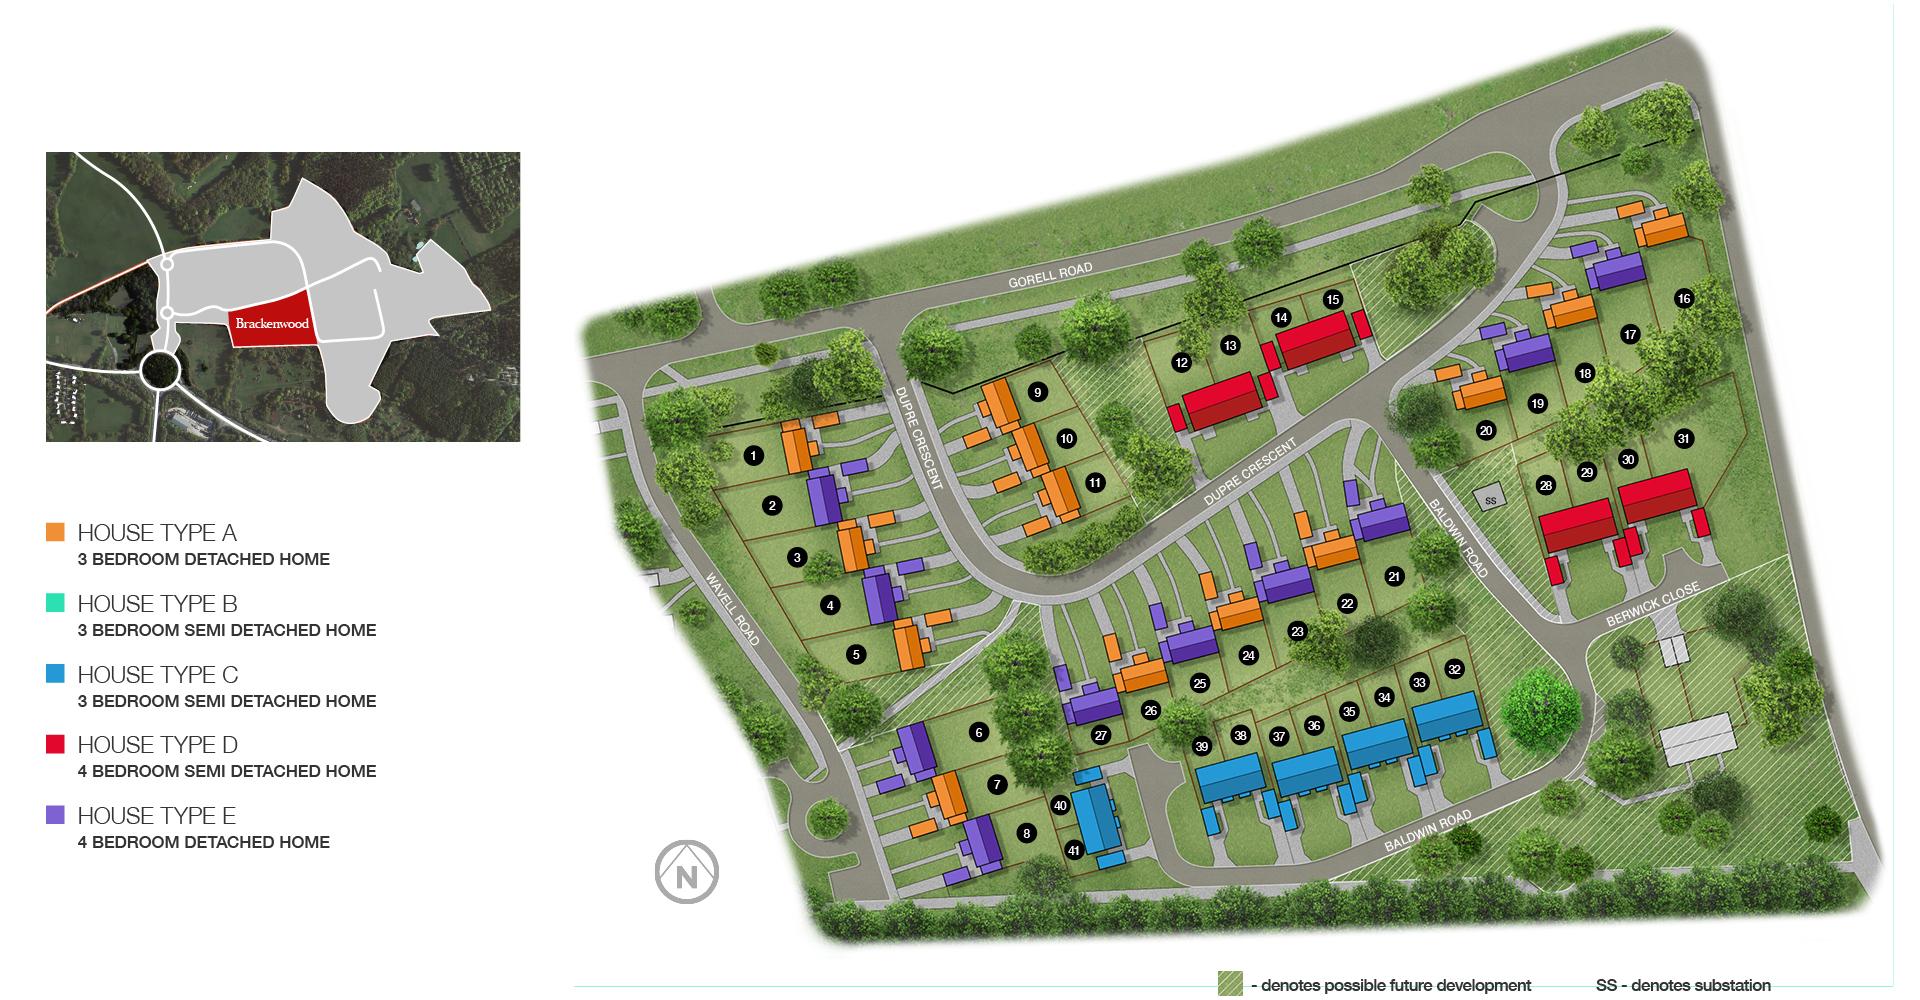 Brackenwood Site Plan